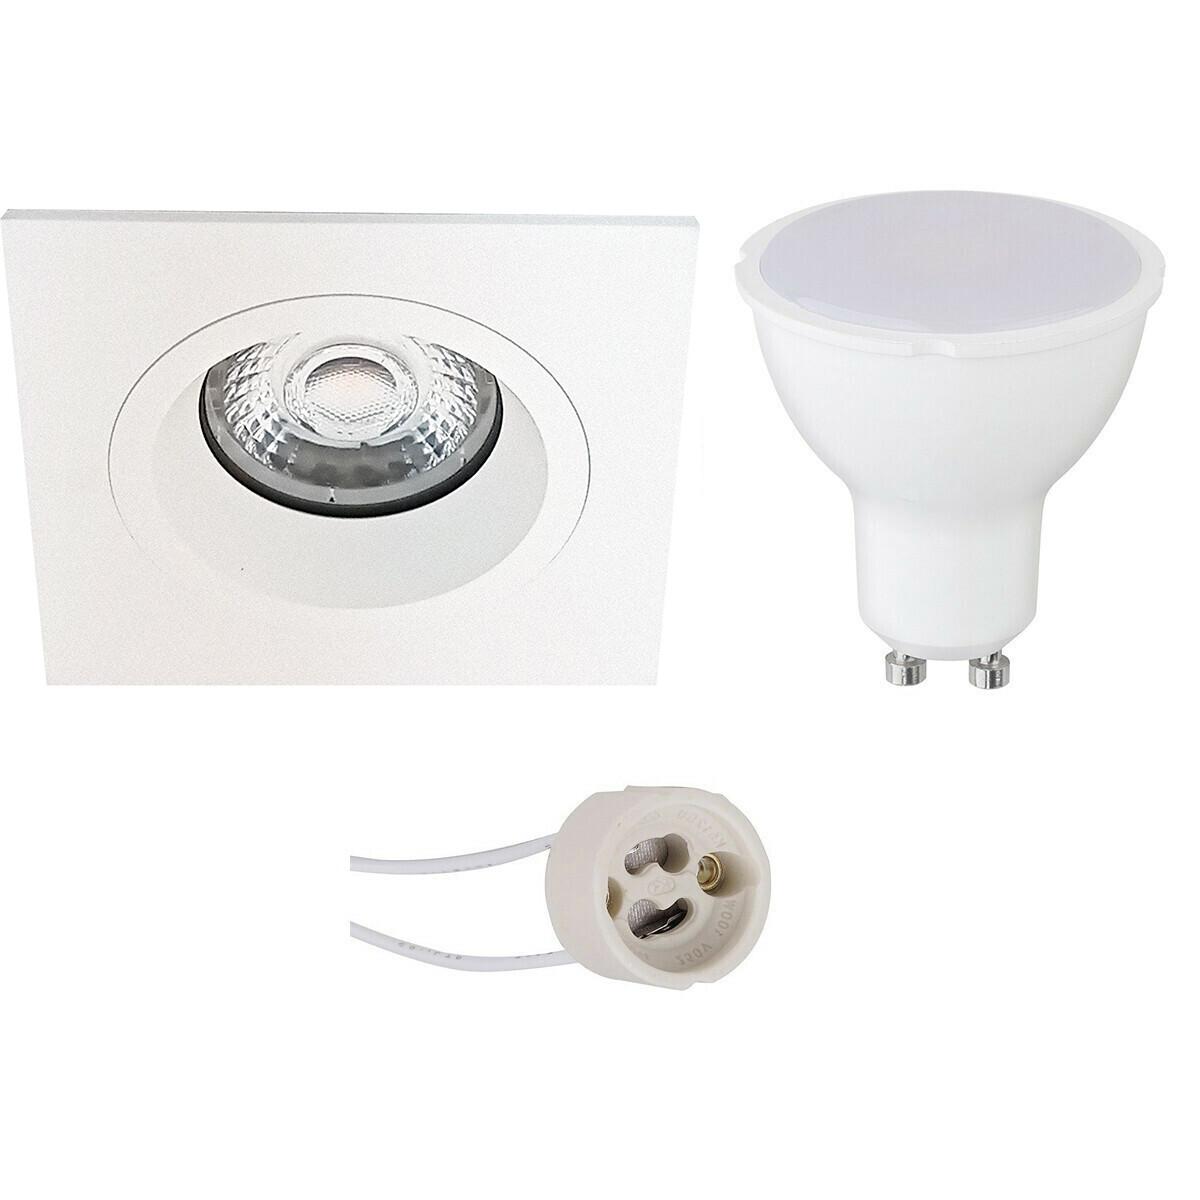 LED Spot Set - Pragmi Rodos Pro - GU10 Fitting - Inbouw Vierkant - Mat Wit - 4W - Warm Wit 3000K - 9